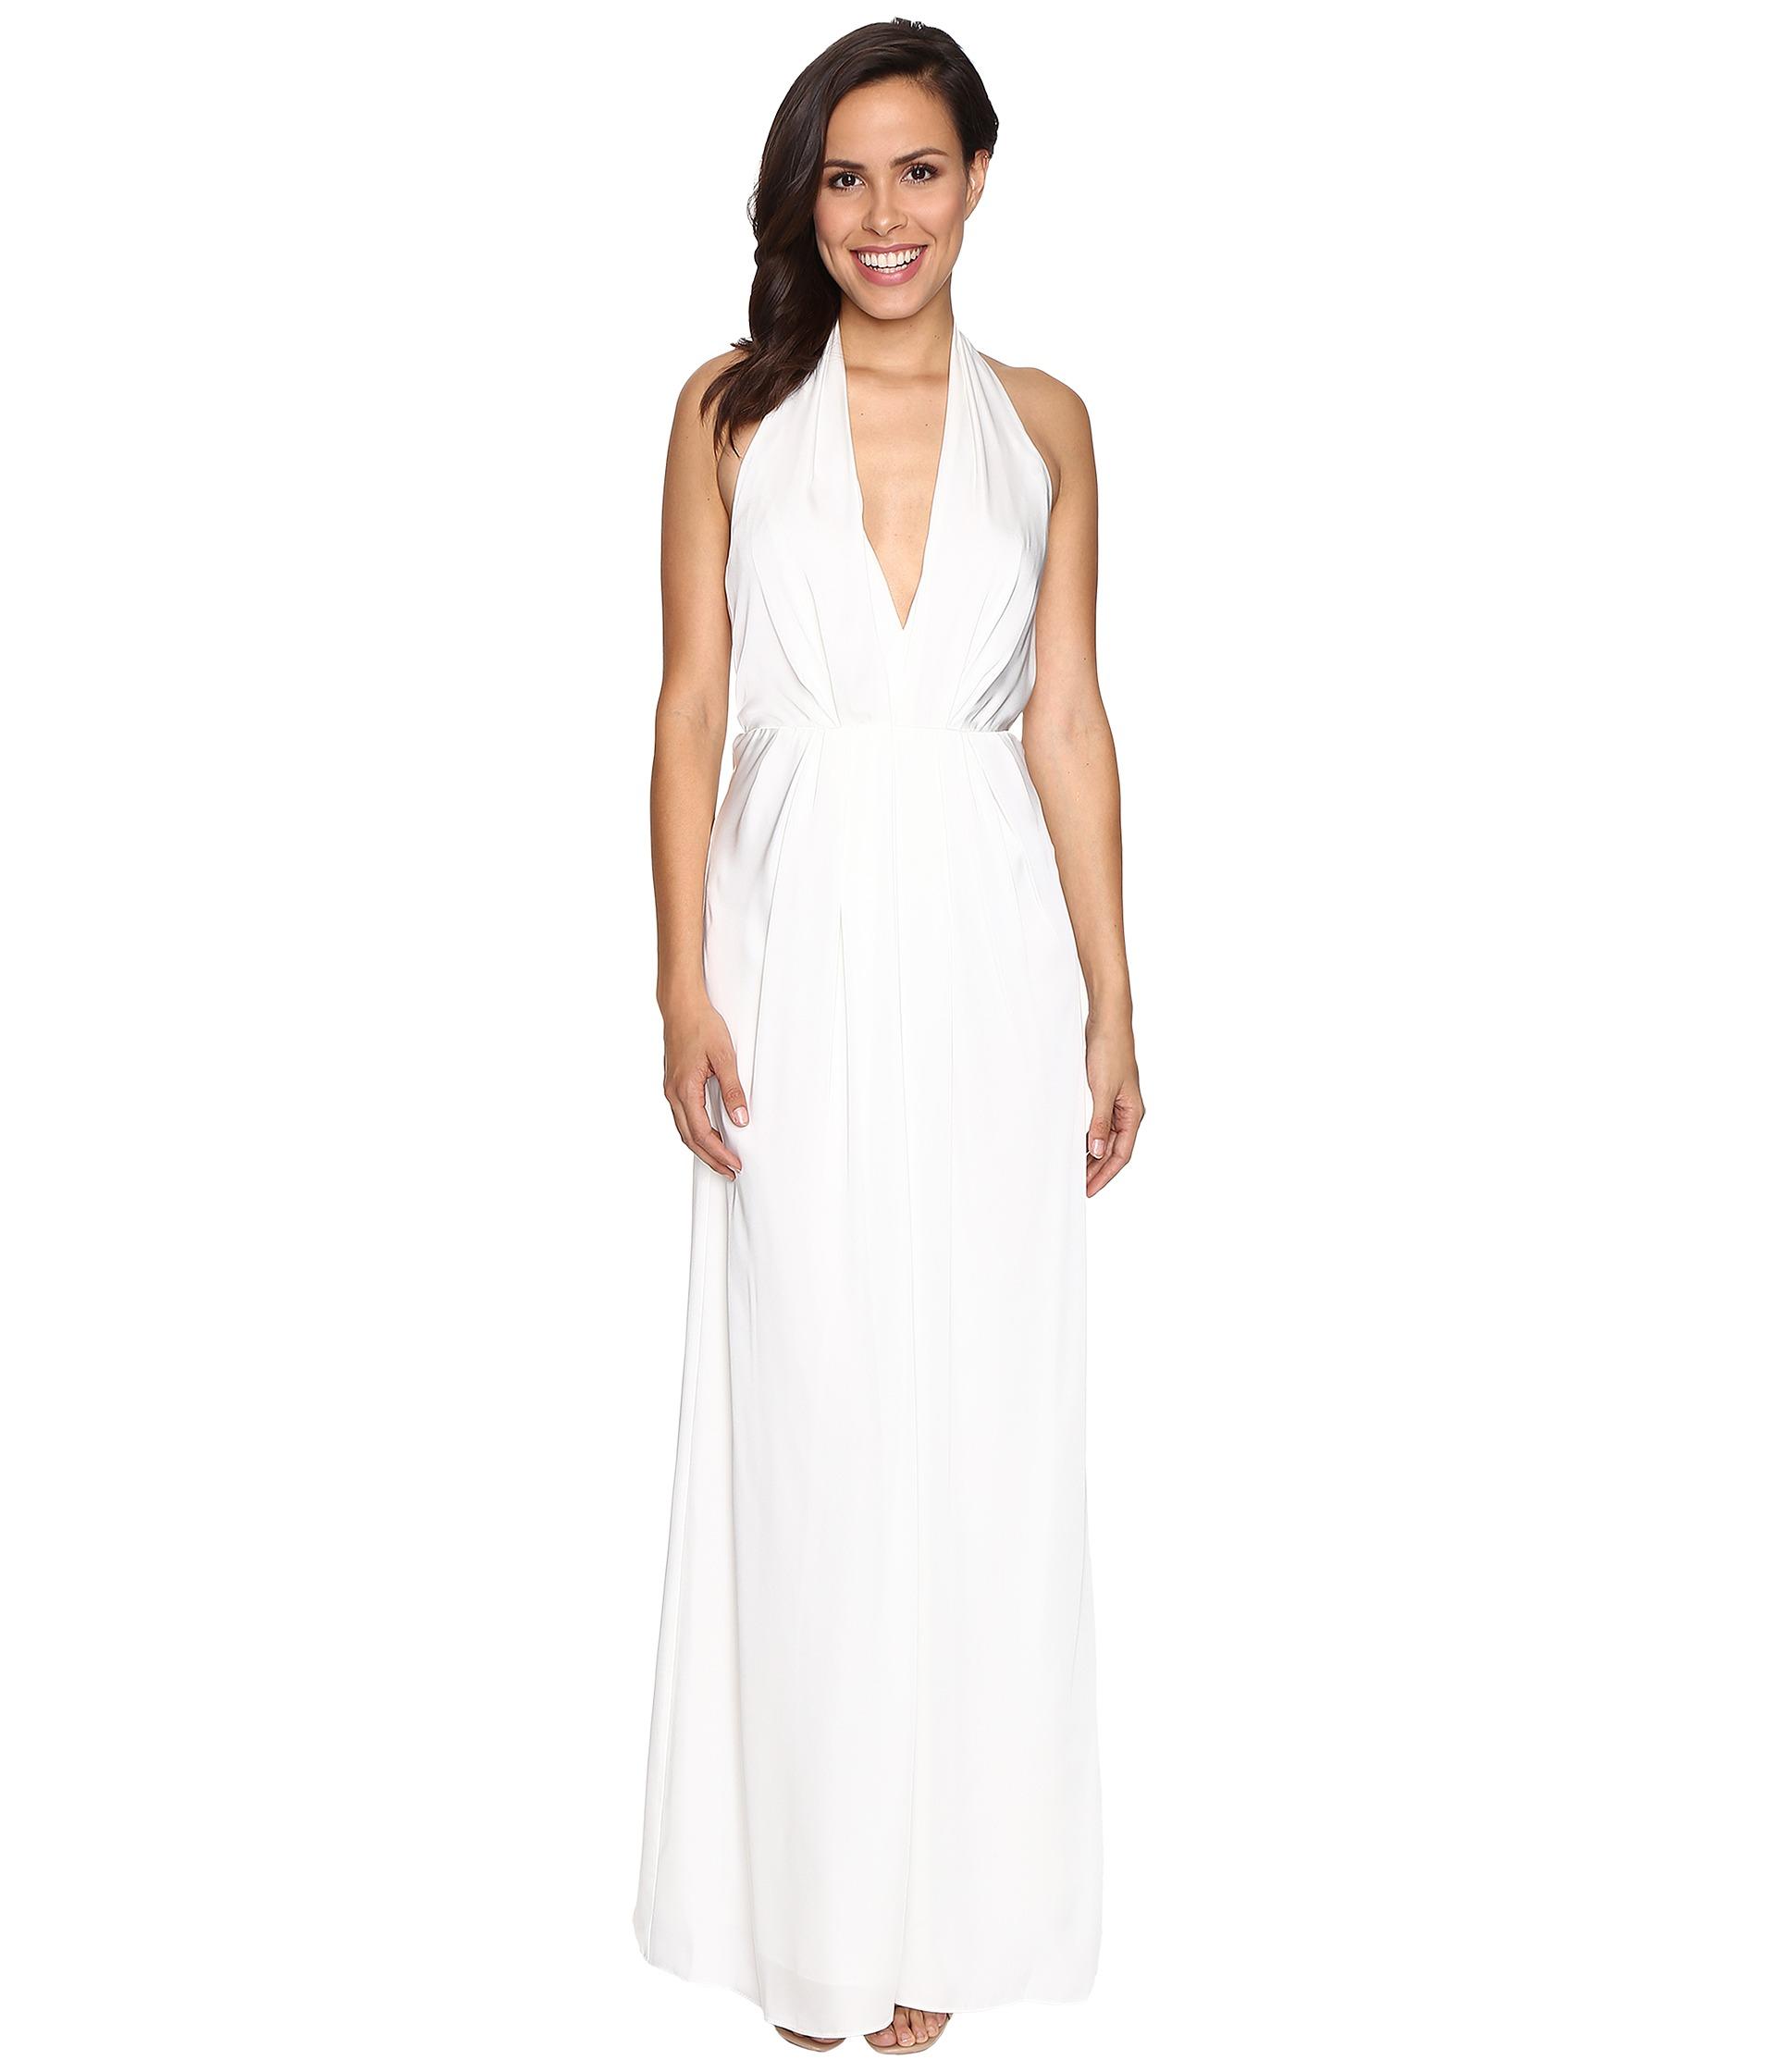 White Halter Dress- Clothing- White - Shipped Free at Zappos